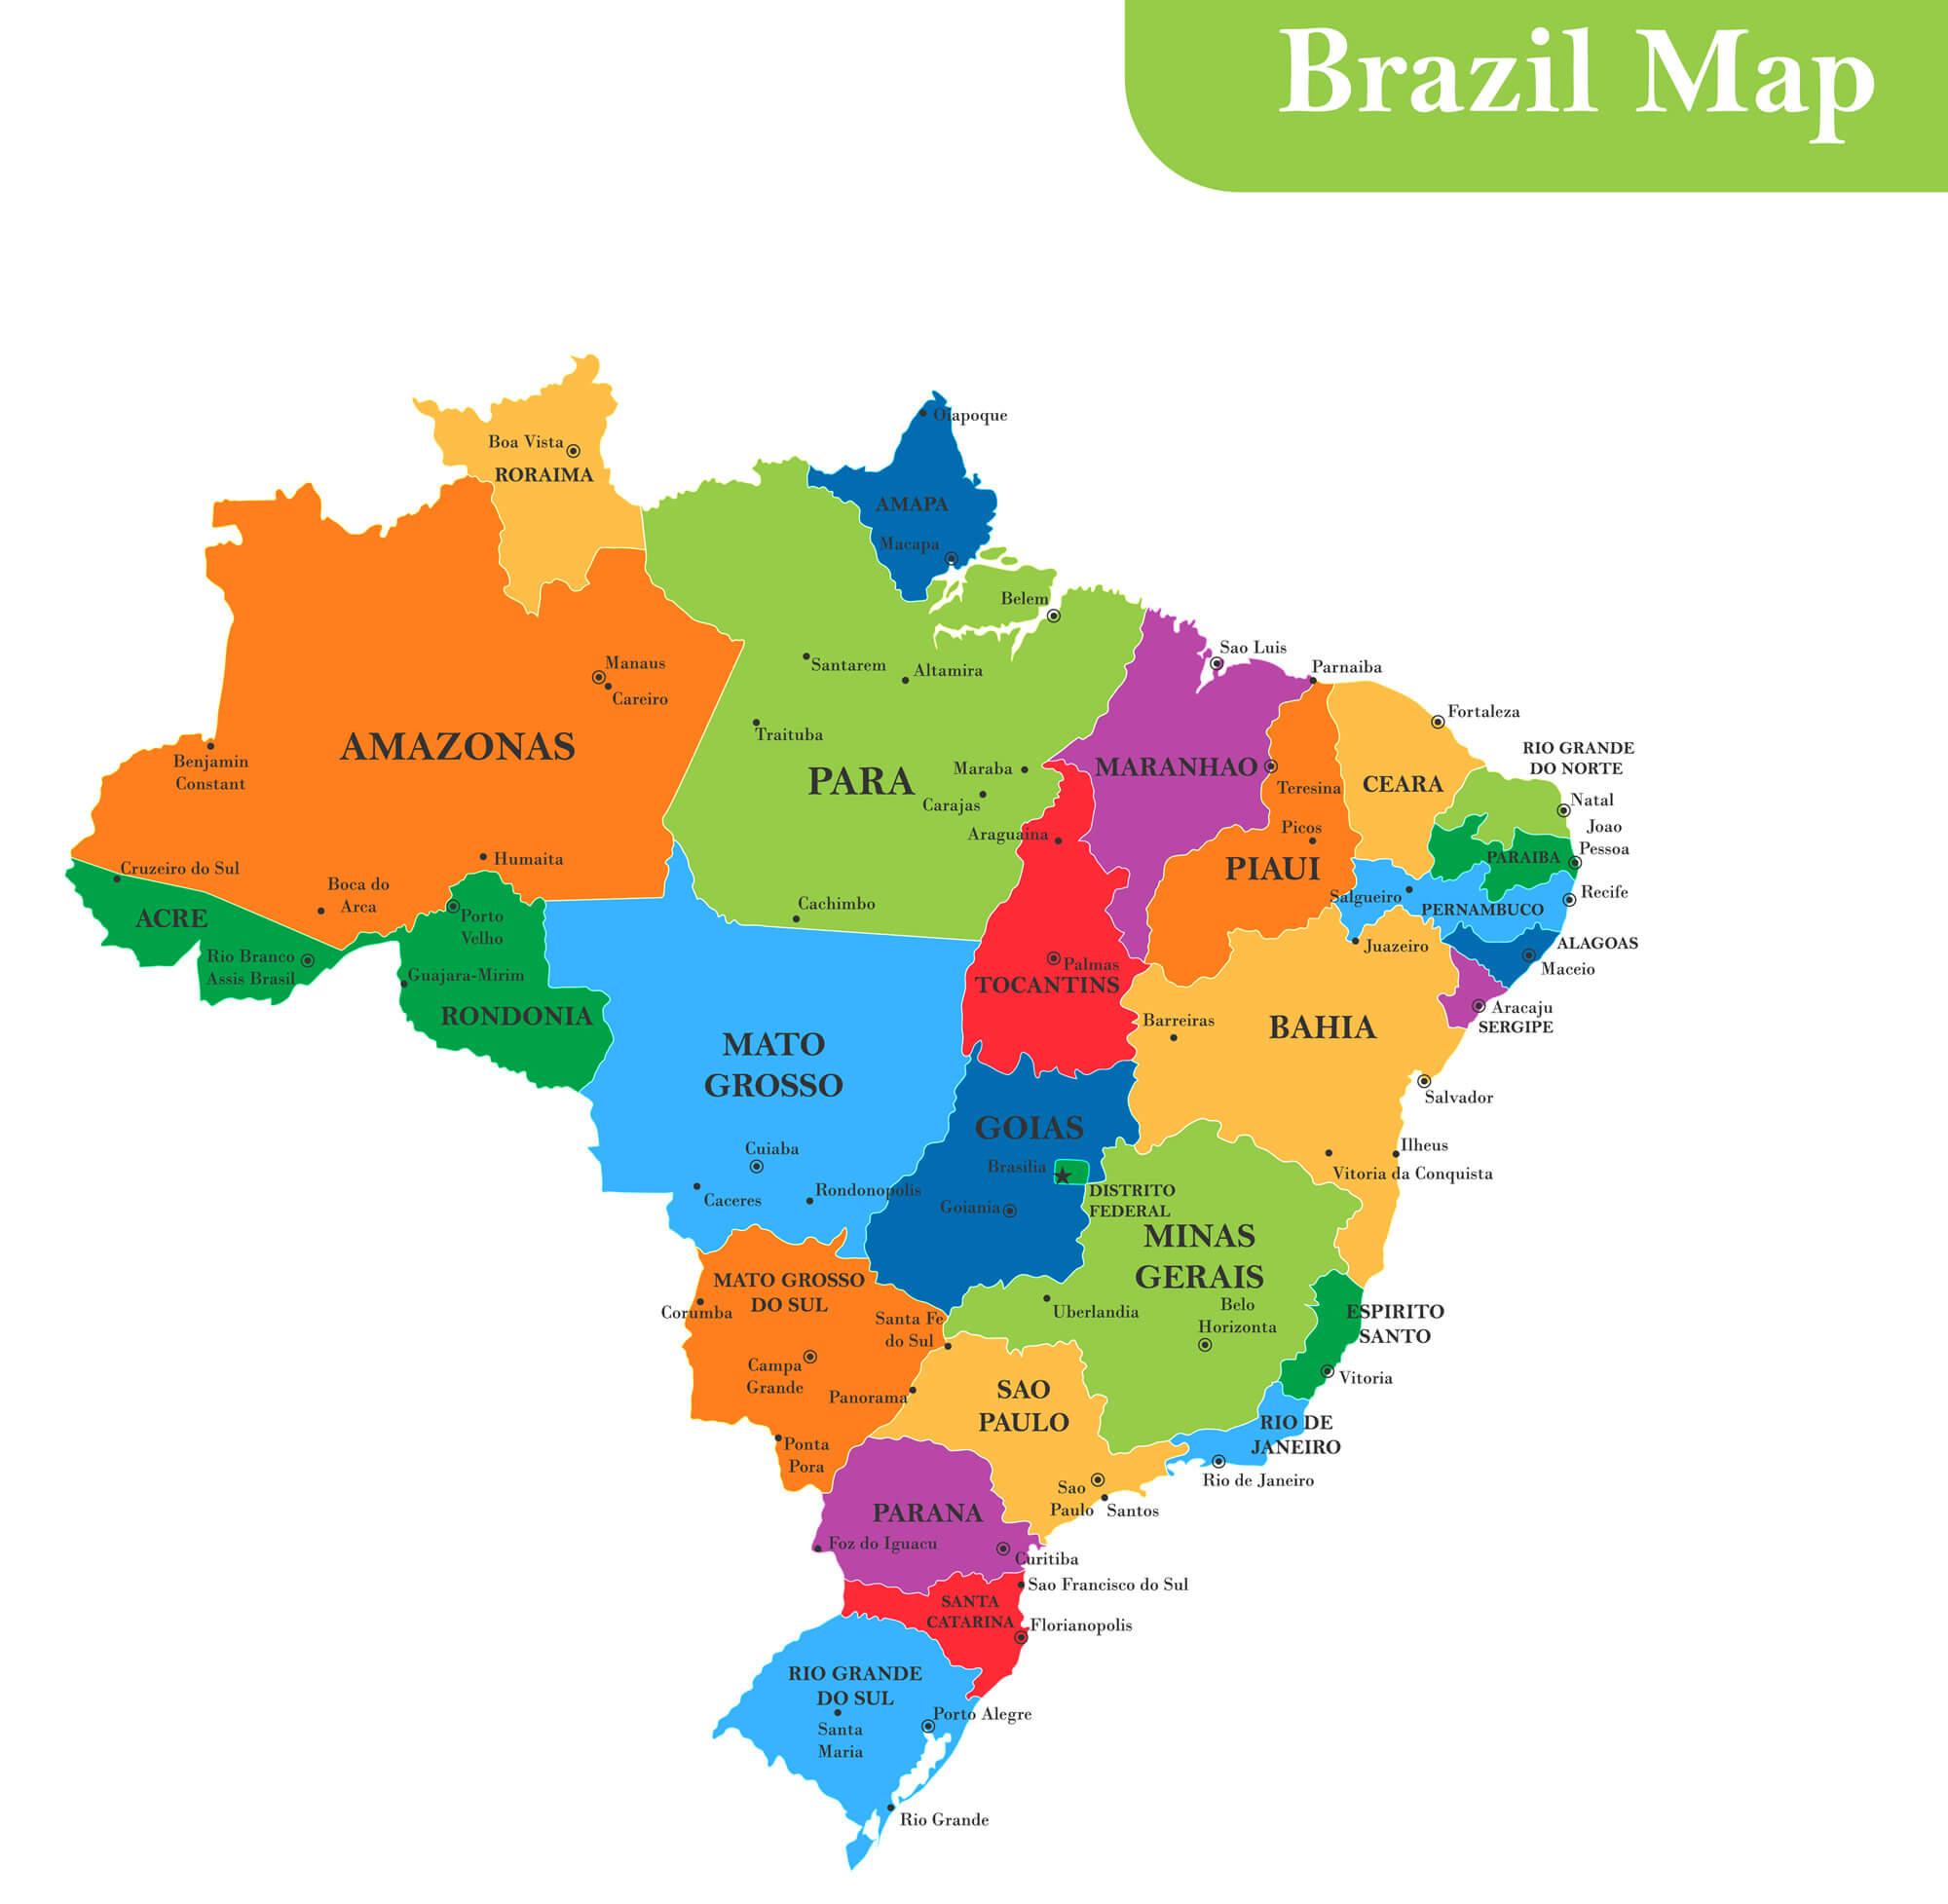 Brazil Provinces Map